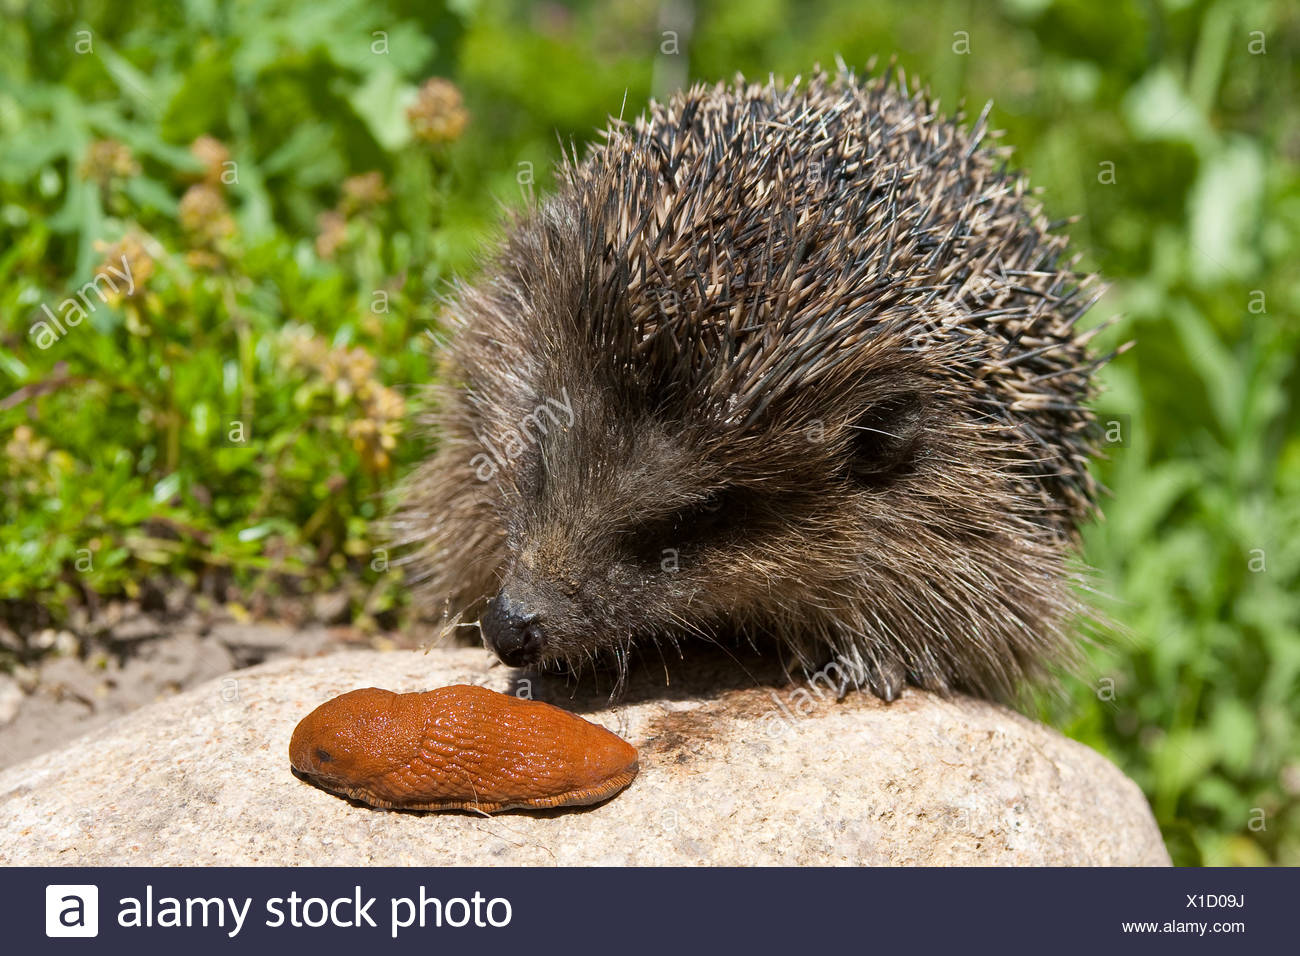 western hedgehog, European hedgehog (Erinaceus europaeus), with roundback slug, Germany - Stock Image